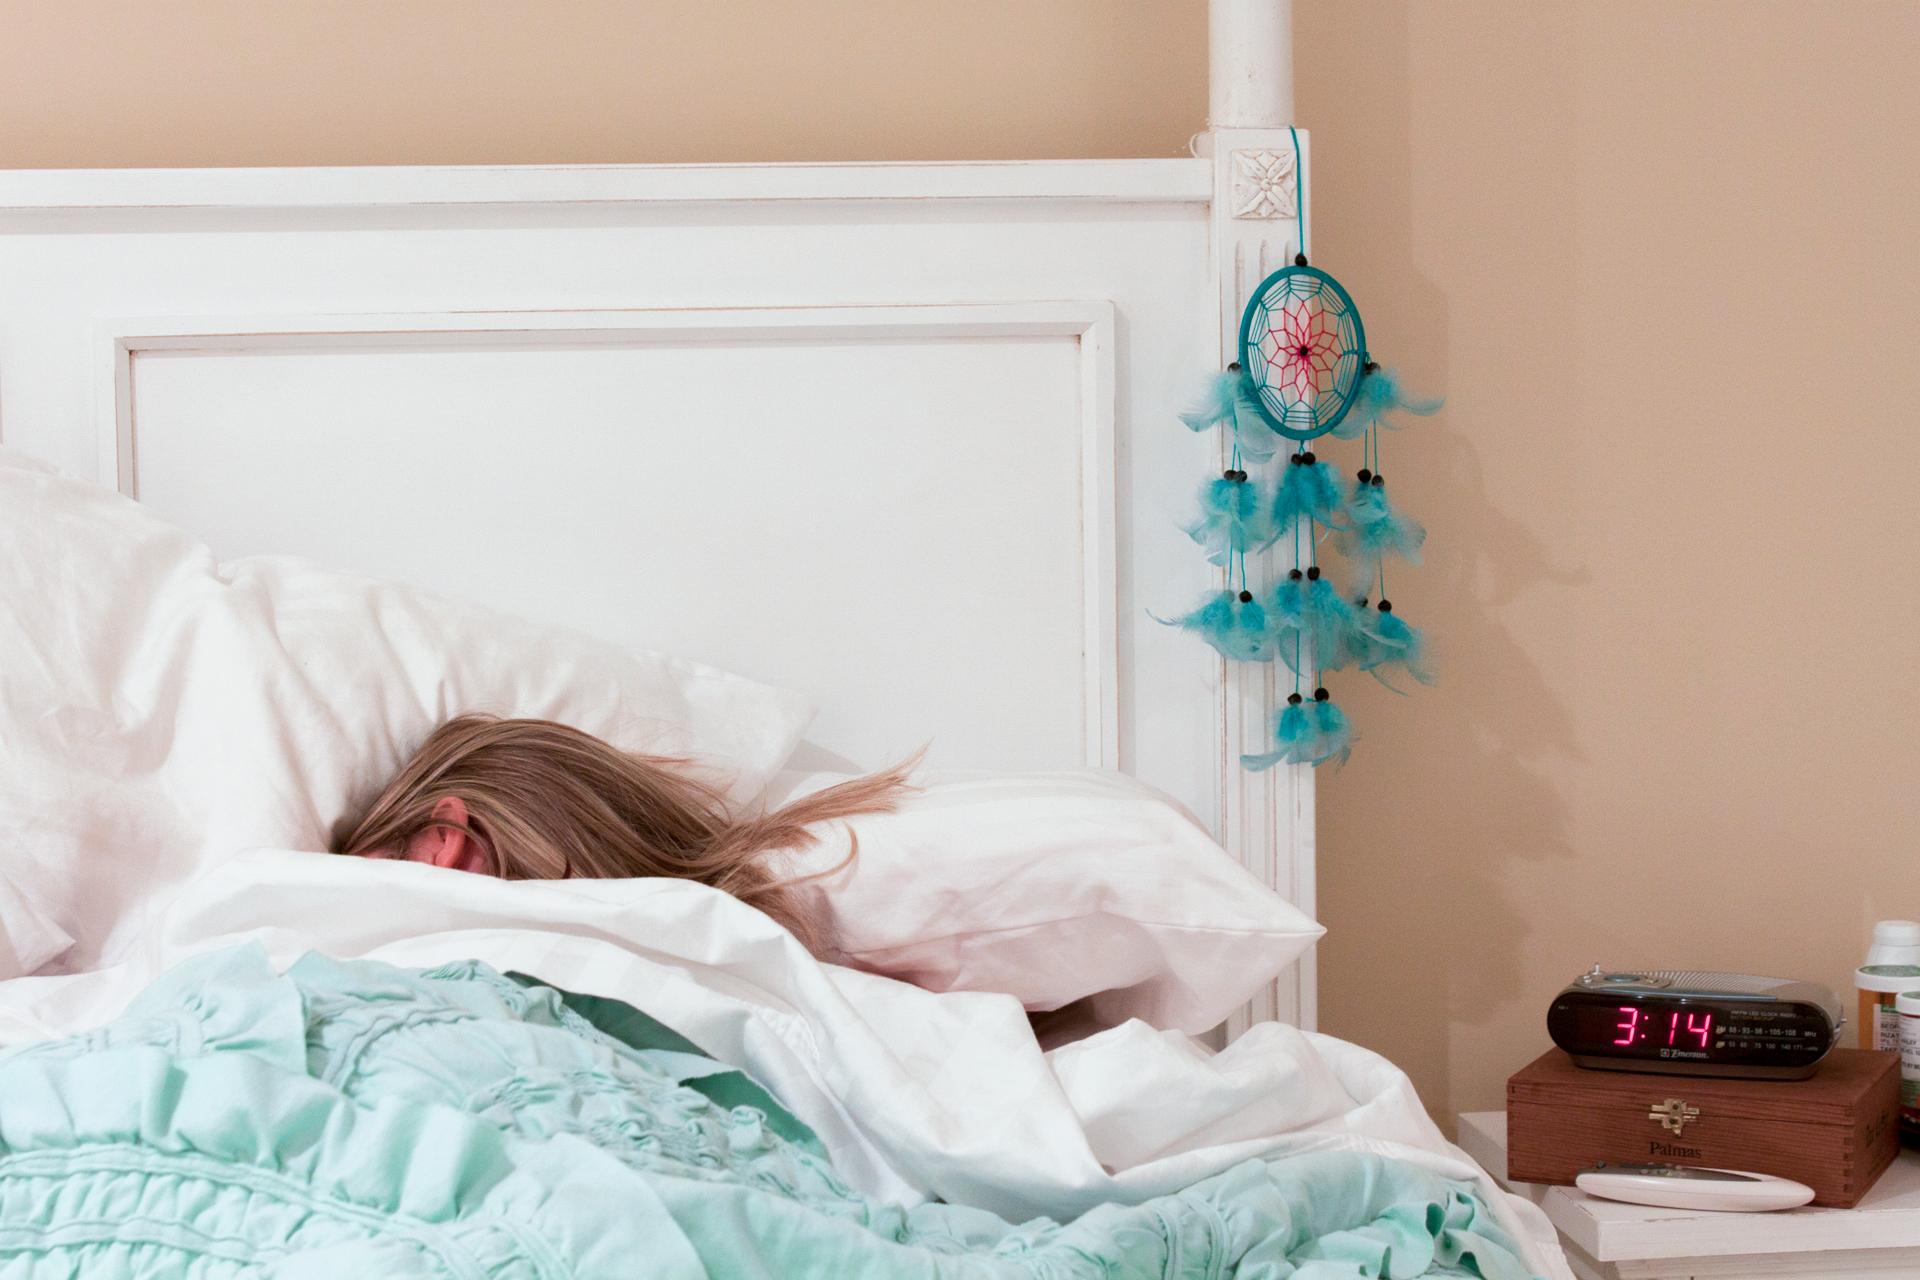 Sleeping Through the Sadness